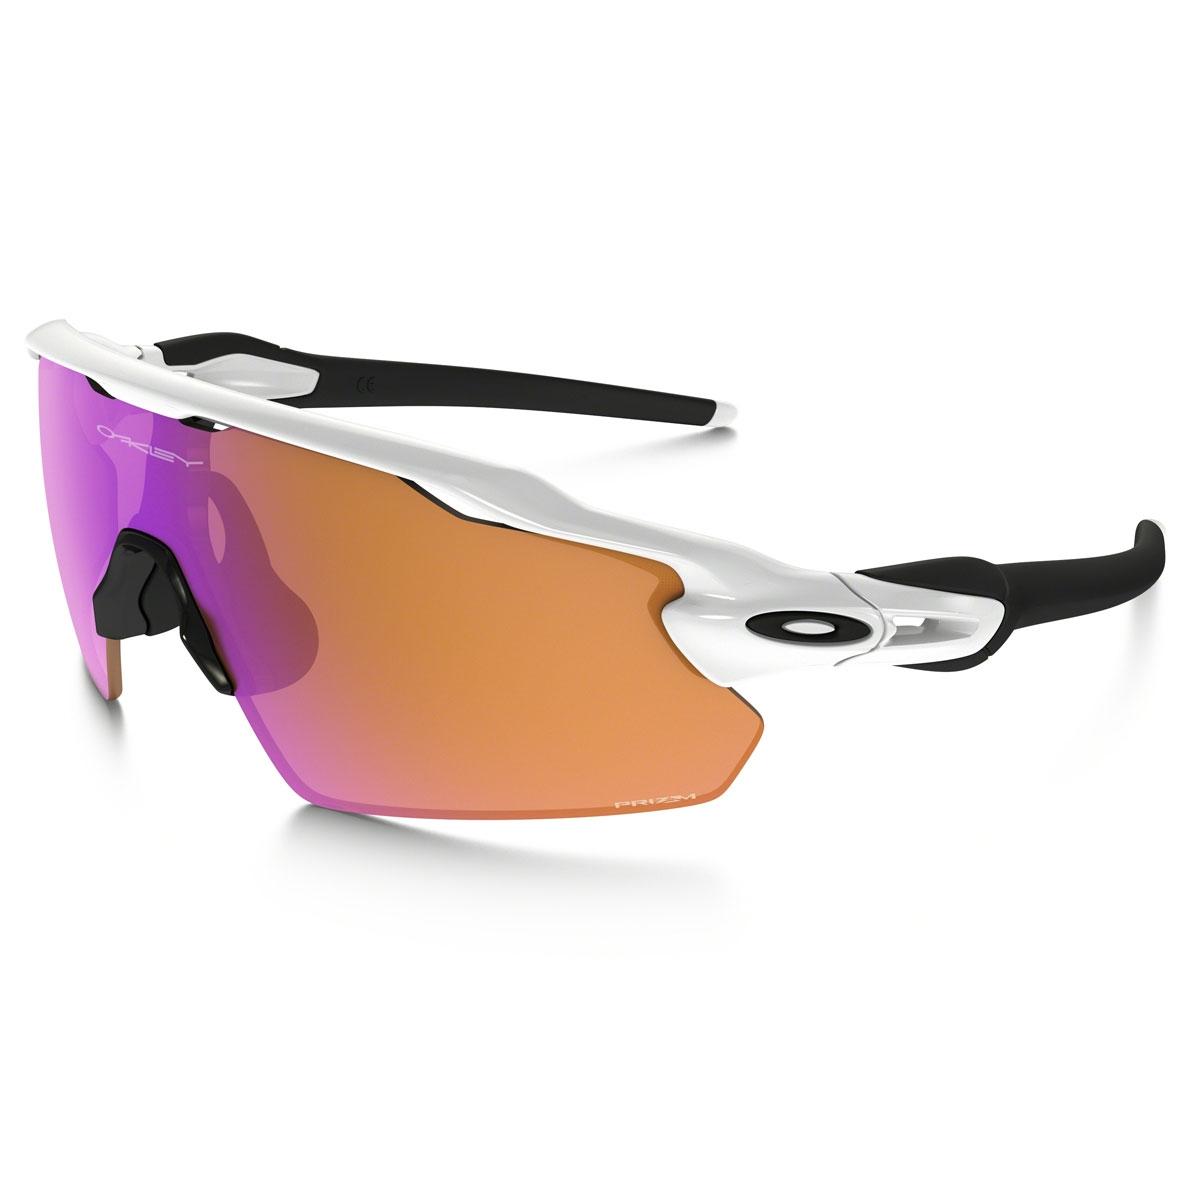 1a7698a877a Image of Oakley Radar EV Pitch Prizm Trail Sunglasses - Polished White Prizm  Trail